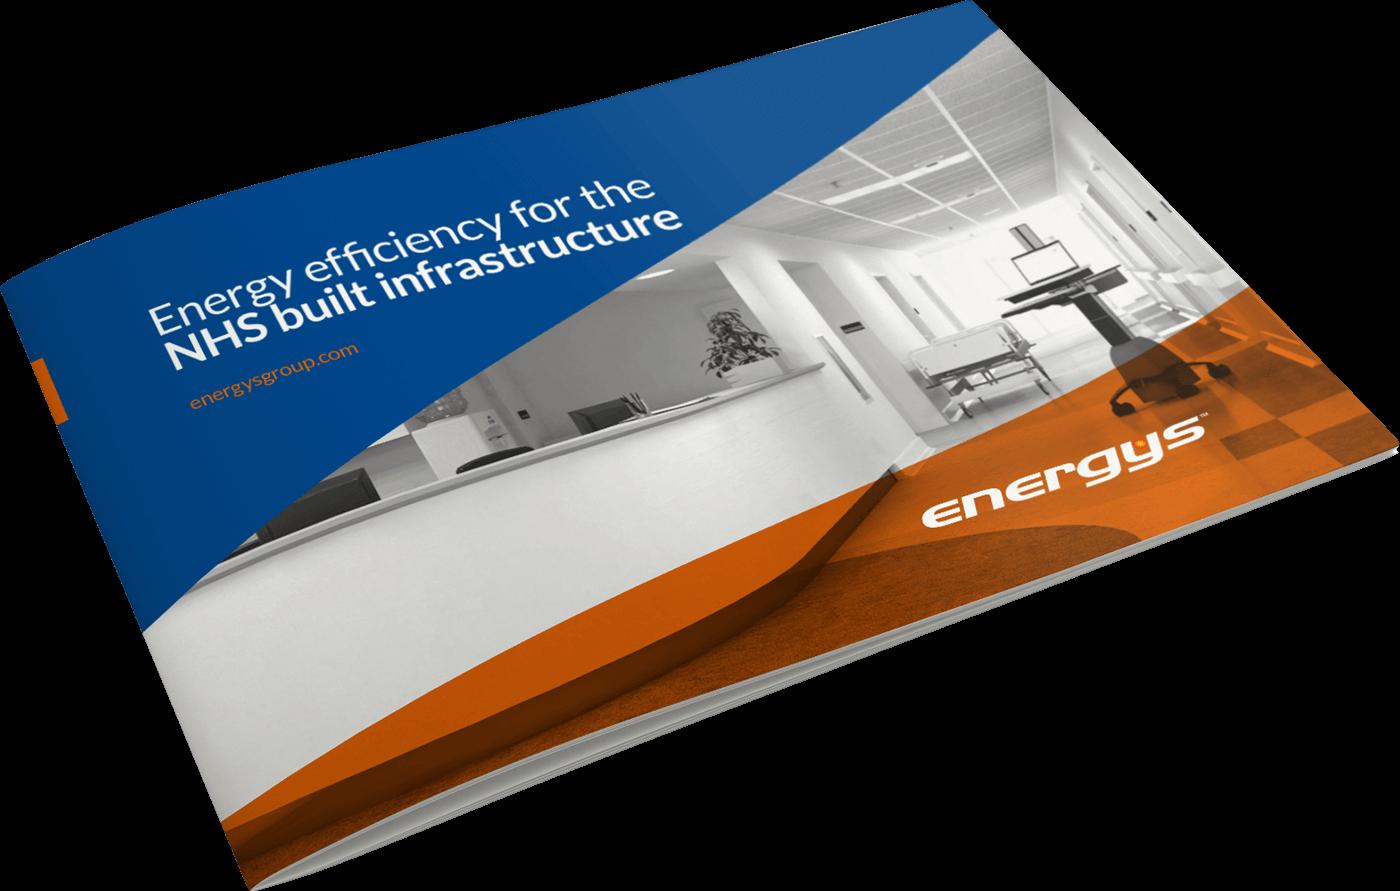 Energys - Energy efficiency for the NHS built infrastructure brochure